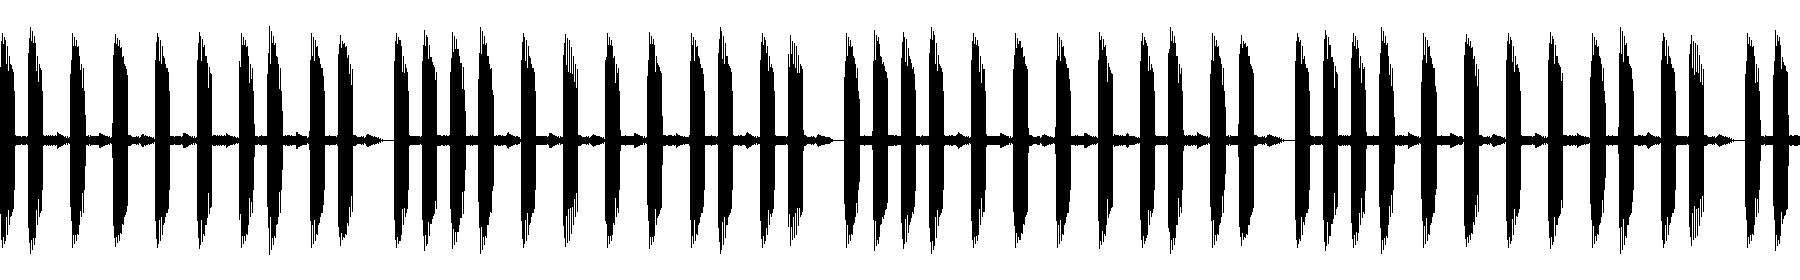 eda 126 cm technoizer